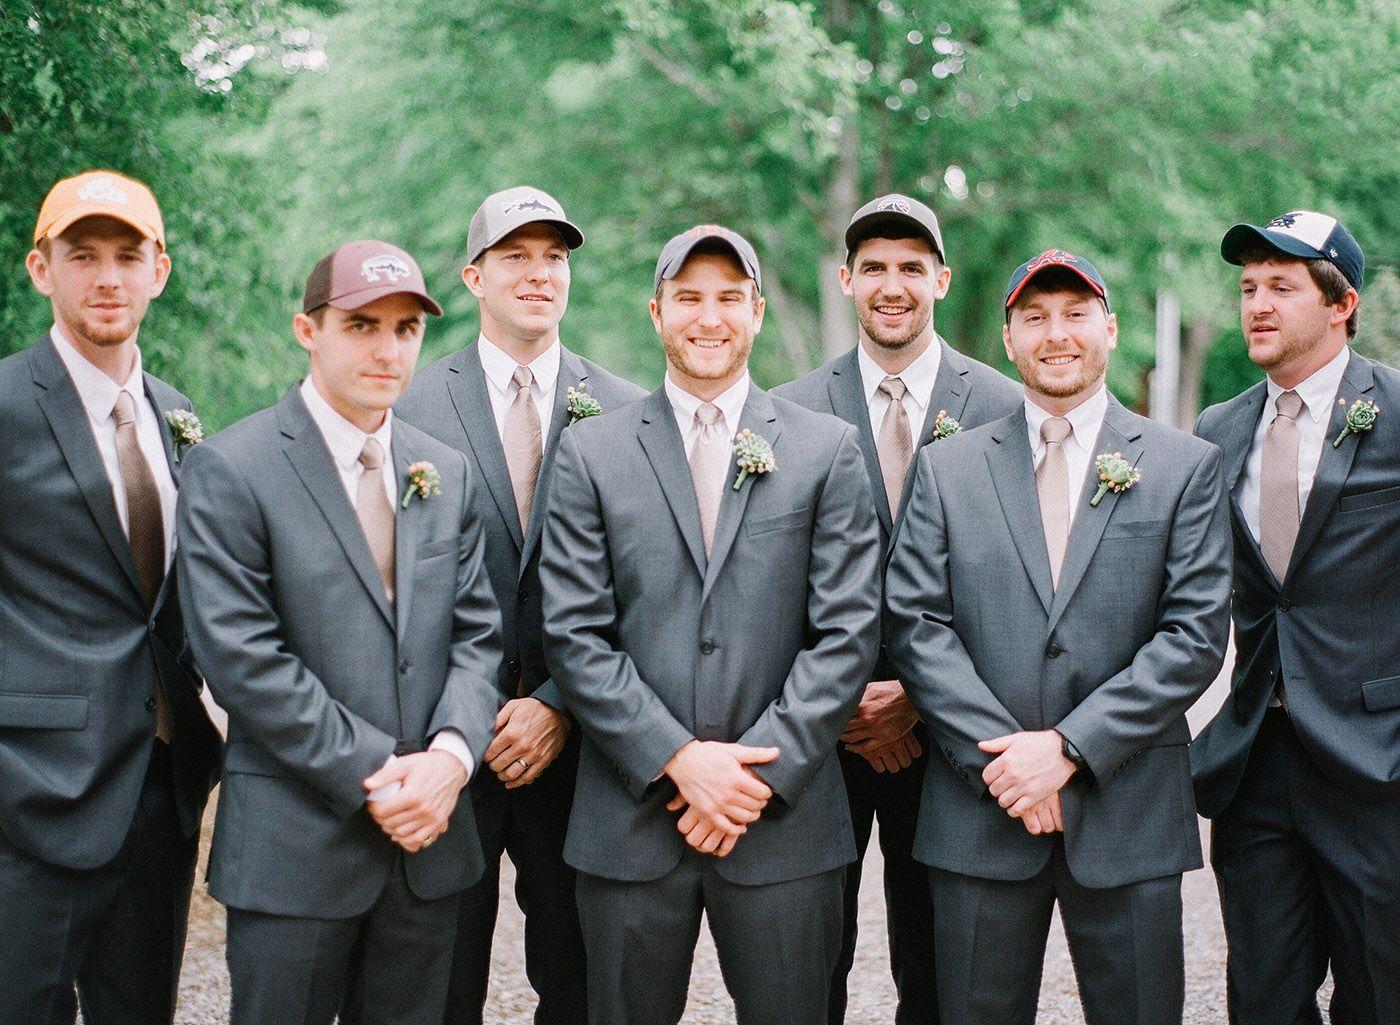 Groomsmen gift idea. Baseball hat groomsmen gift. Green Door Gourmet  Nashville wedding venue. Photo  Leslee Mitchell. 751b82f2697